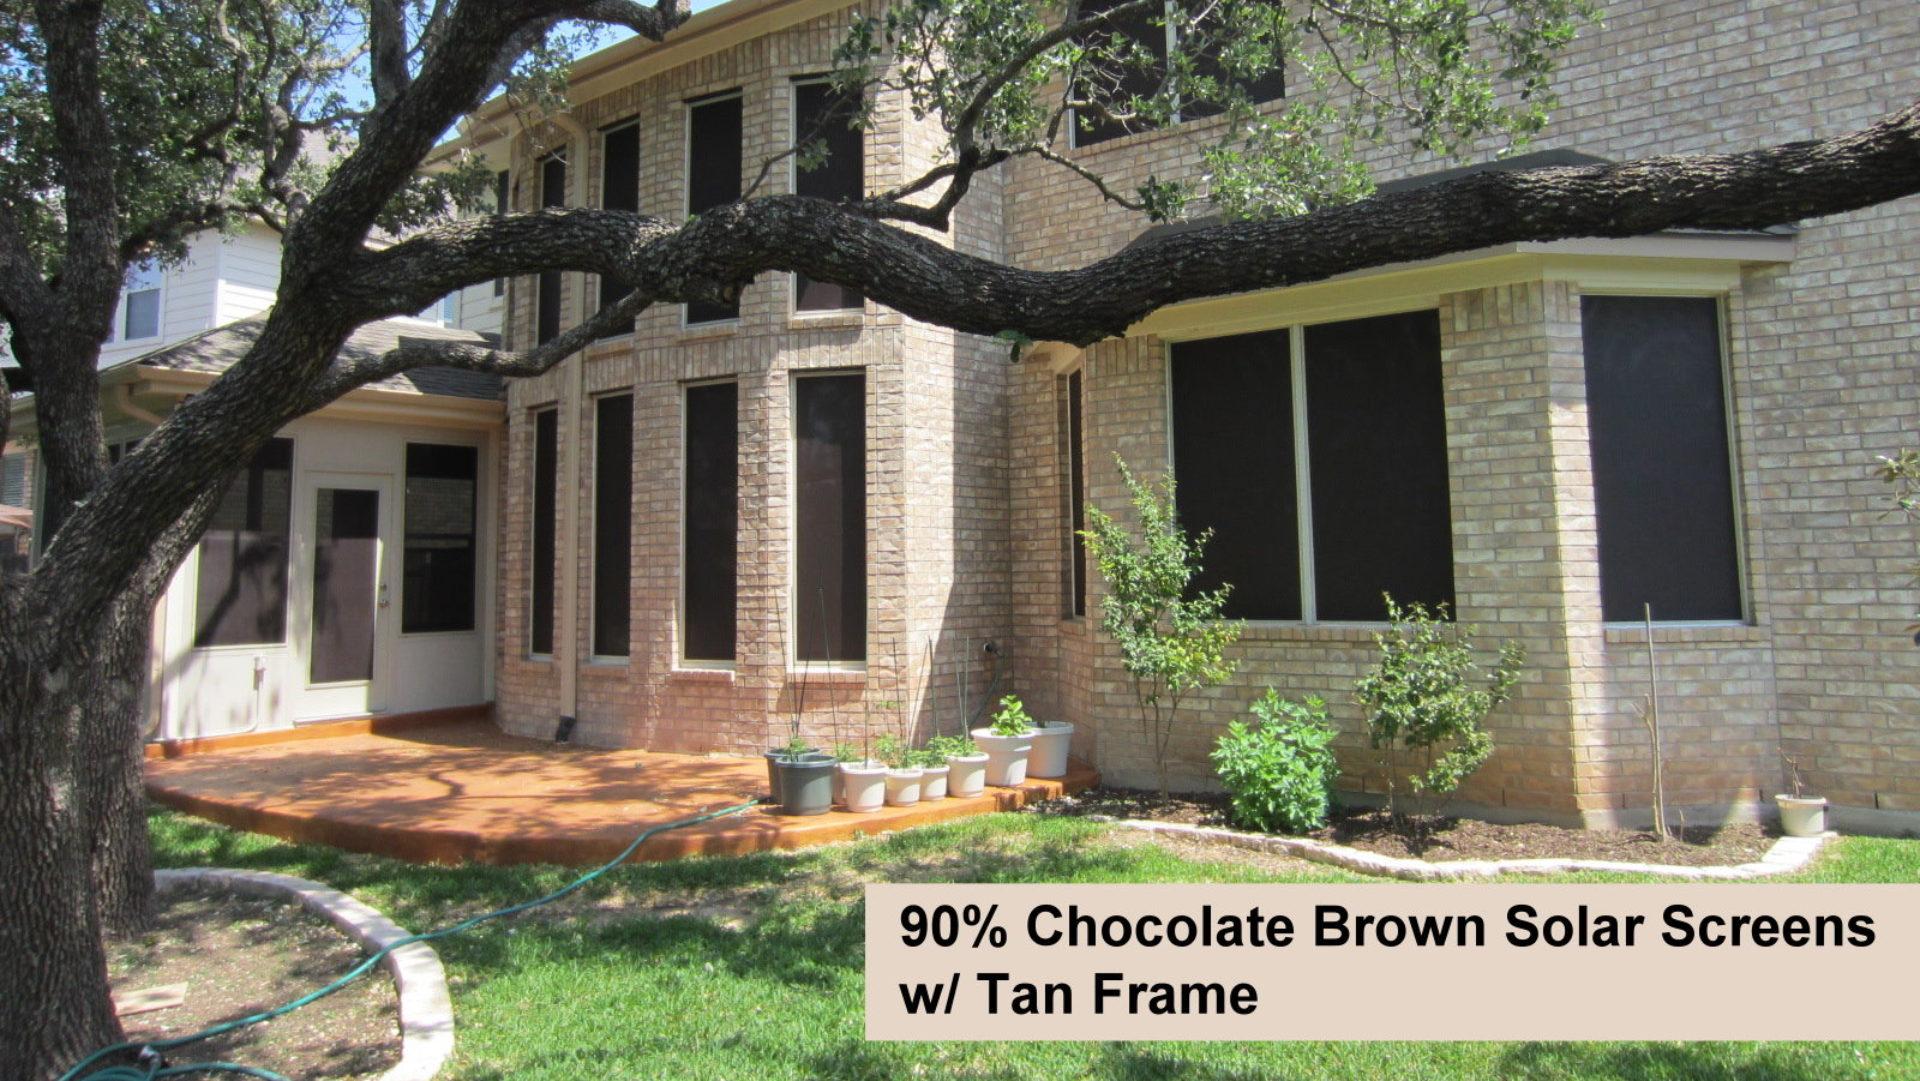 Solar Screens by Josh, Austin, TX